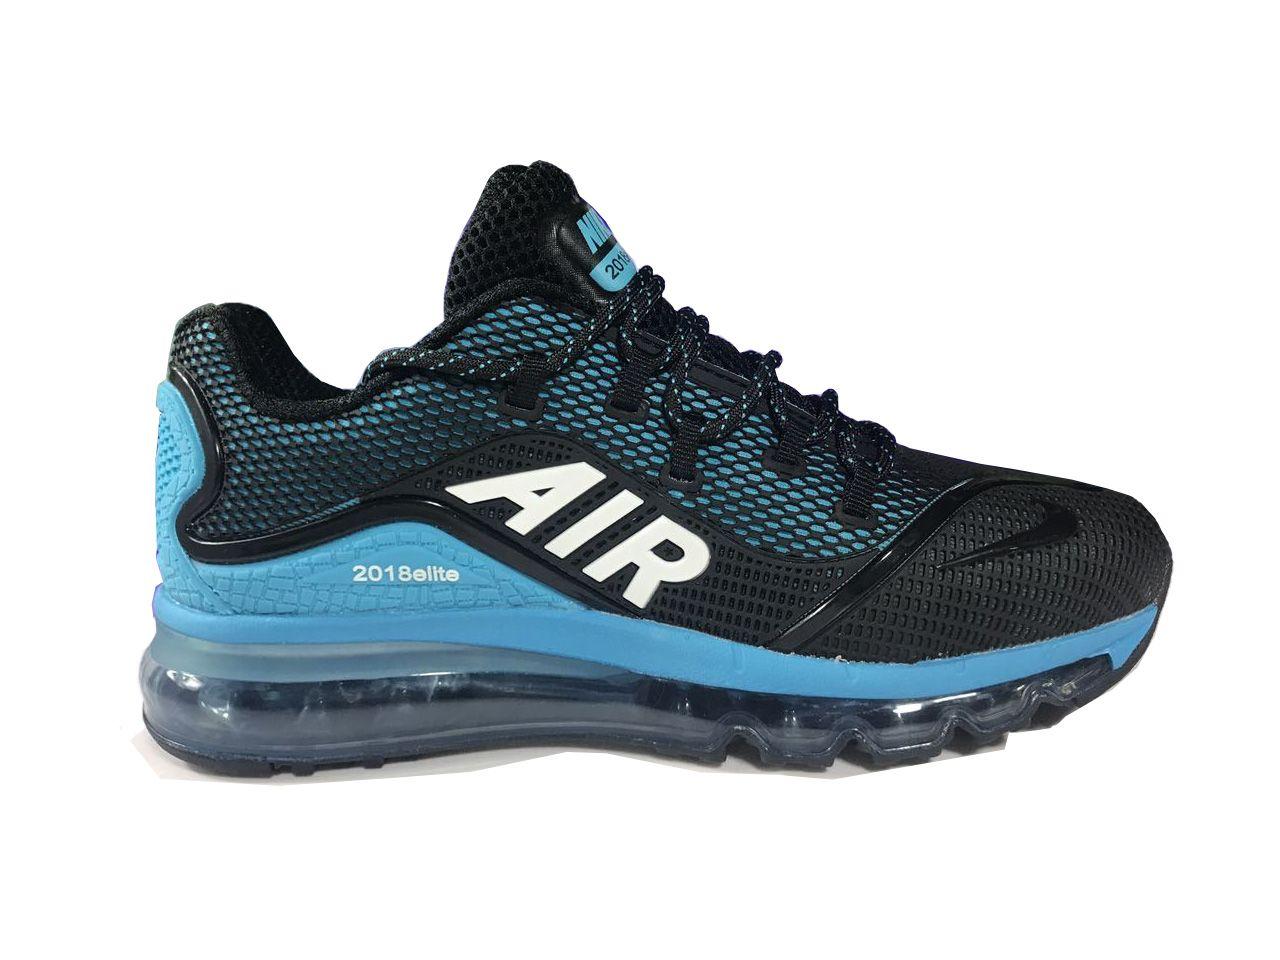 new product a7865 ea4ef Men s UK Nike Air Max 2018 Elite KPU TPU Shoes Black Jade Trainers UK Sale